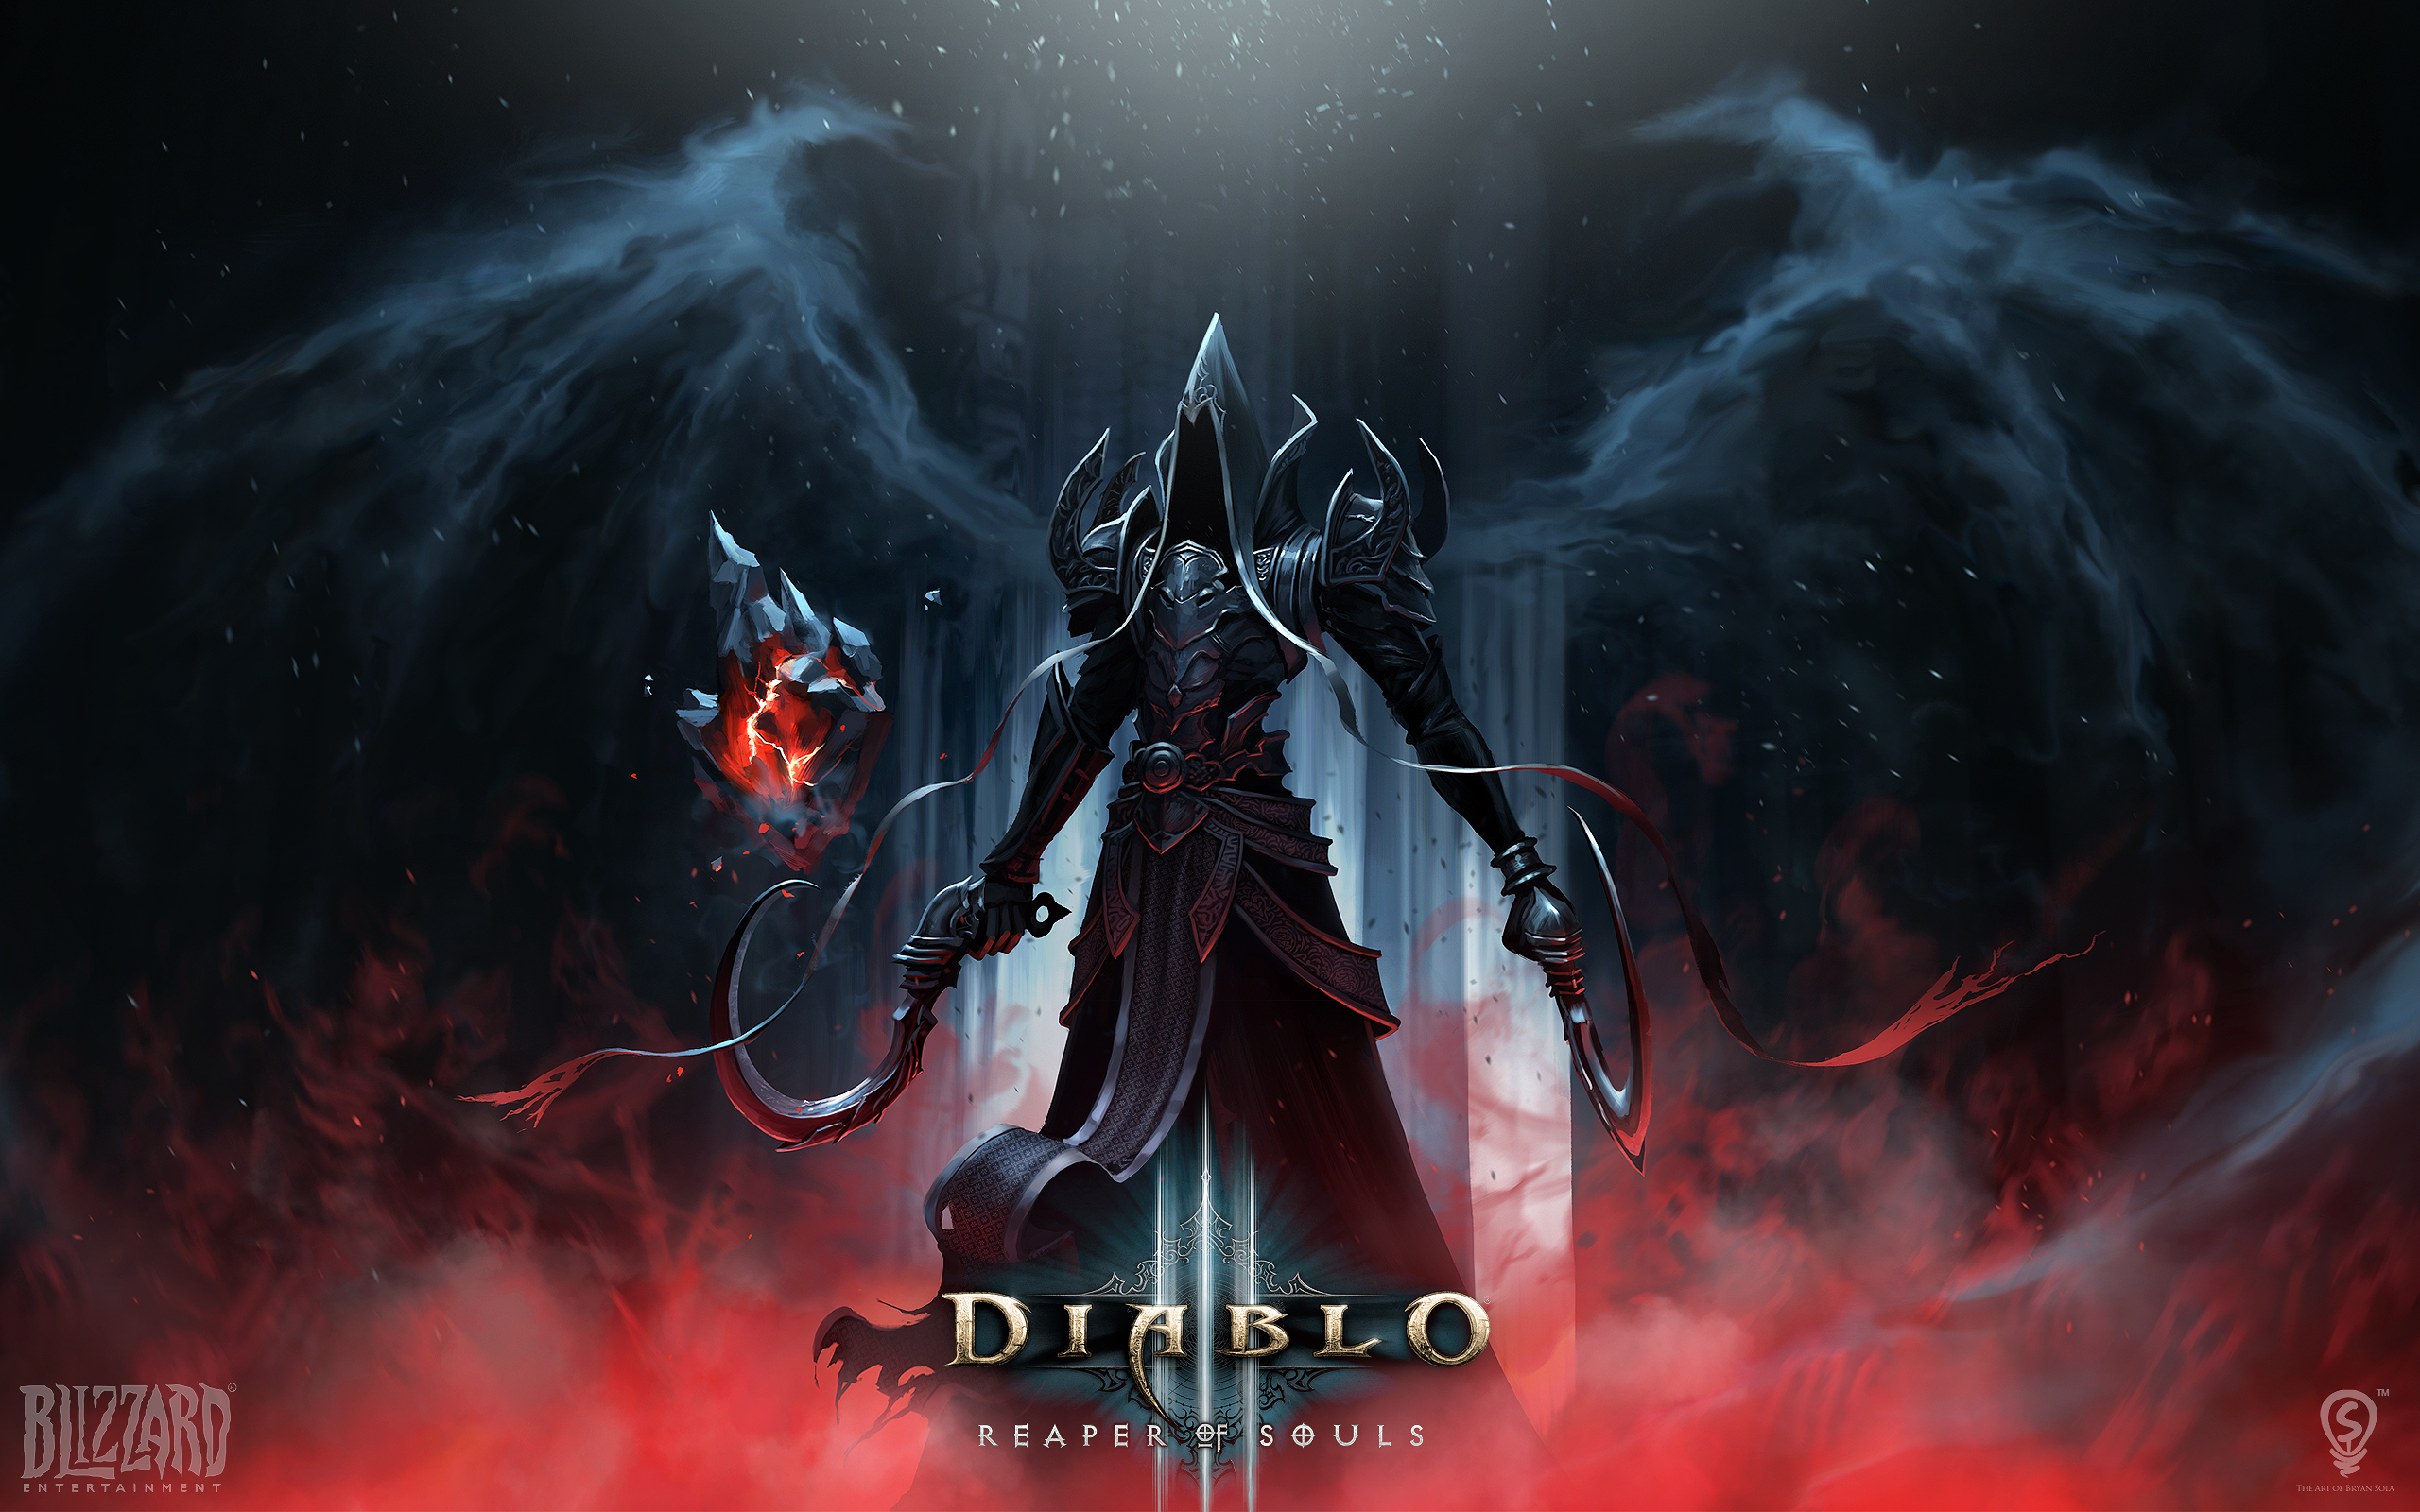 reaper_of_souls_blizzard_by_bpsola-d6ln8ar